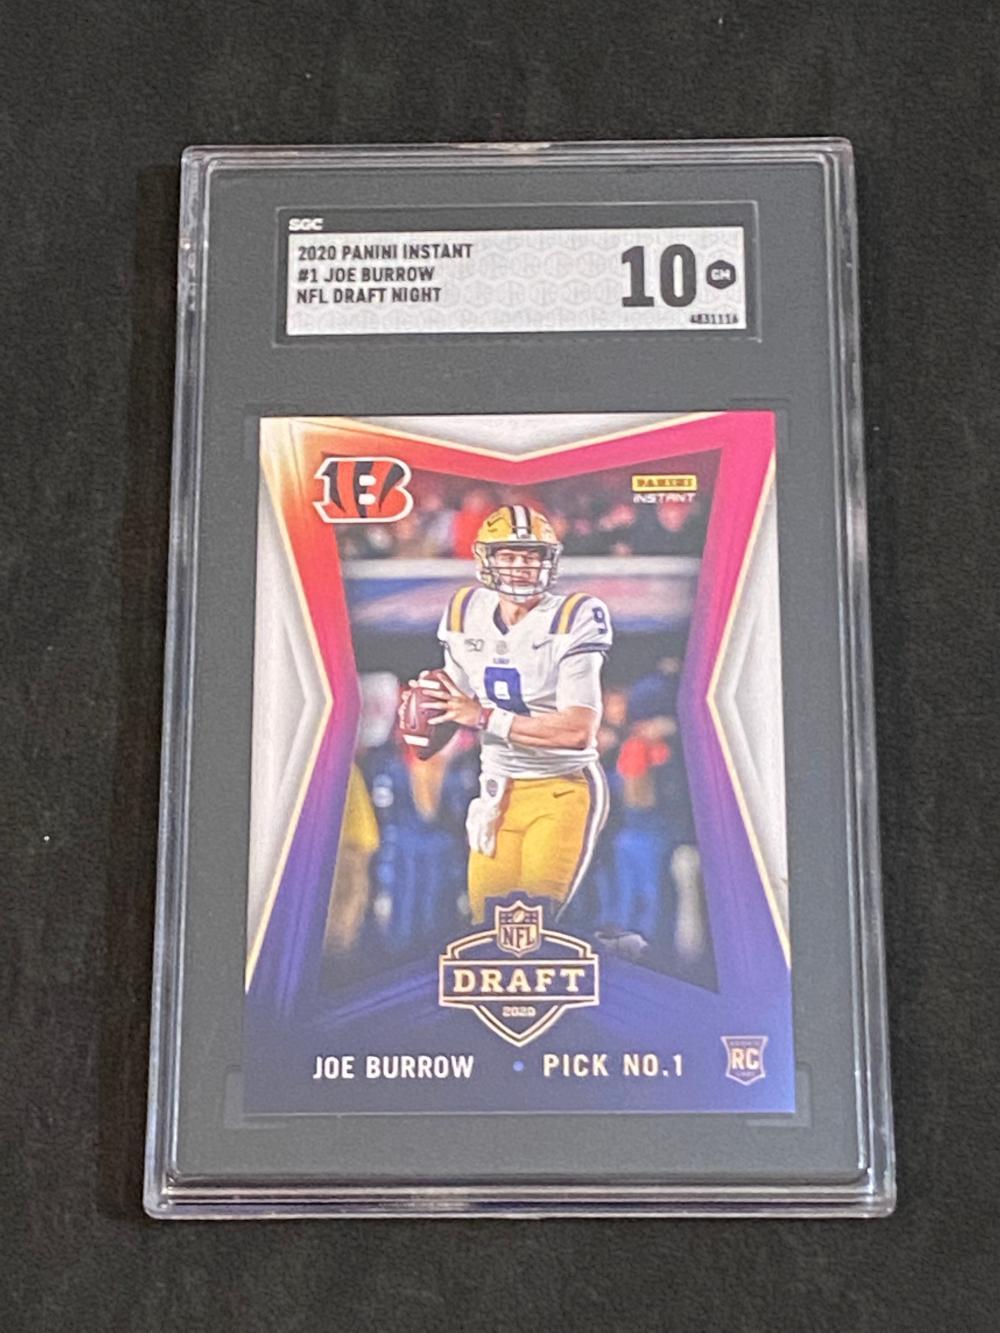 SGC 10 (Gem Mint) Panini Instant RC NFL Draft Night Joe Burrow Rookie #1 Football Card - (1 of 8156)